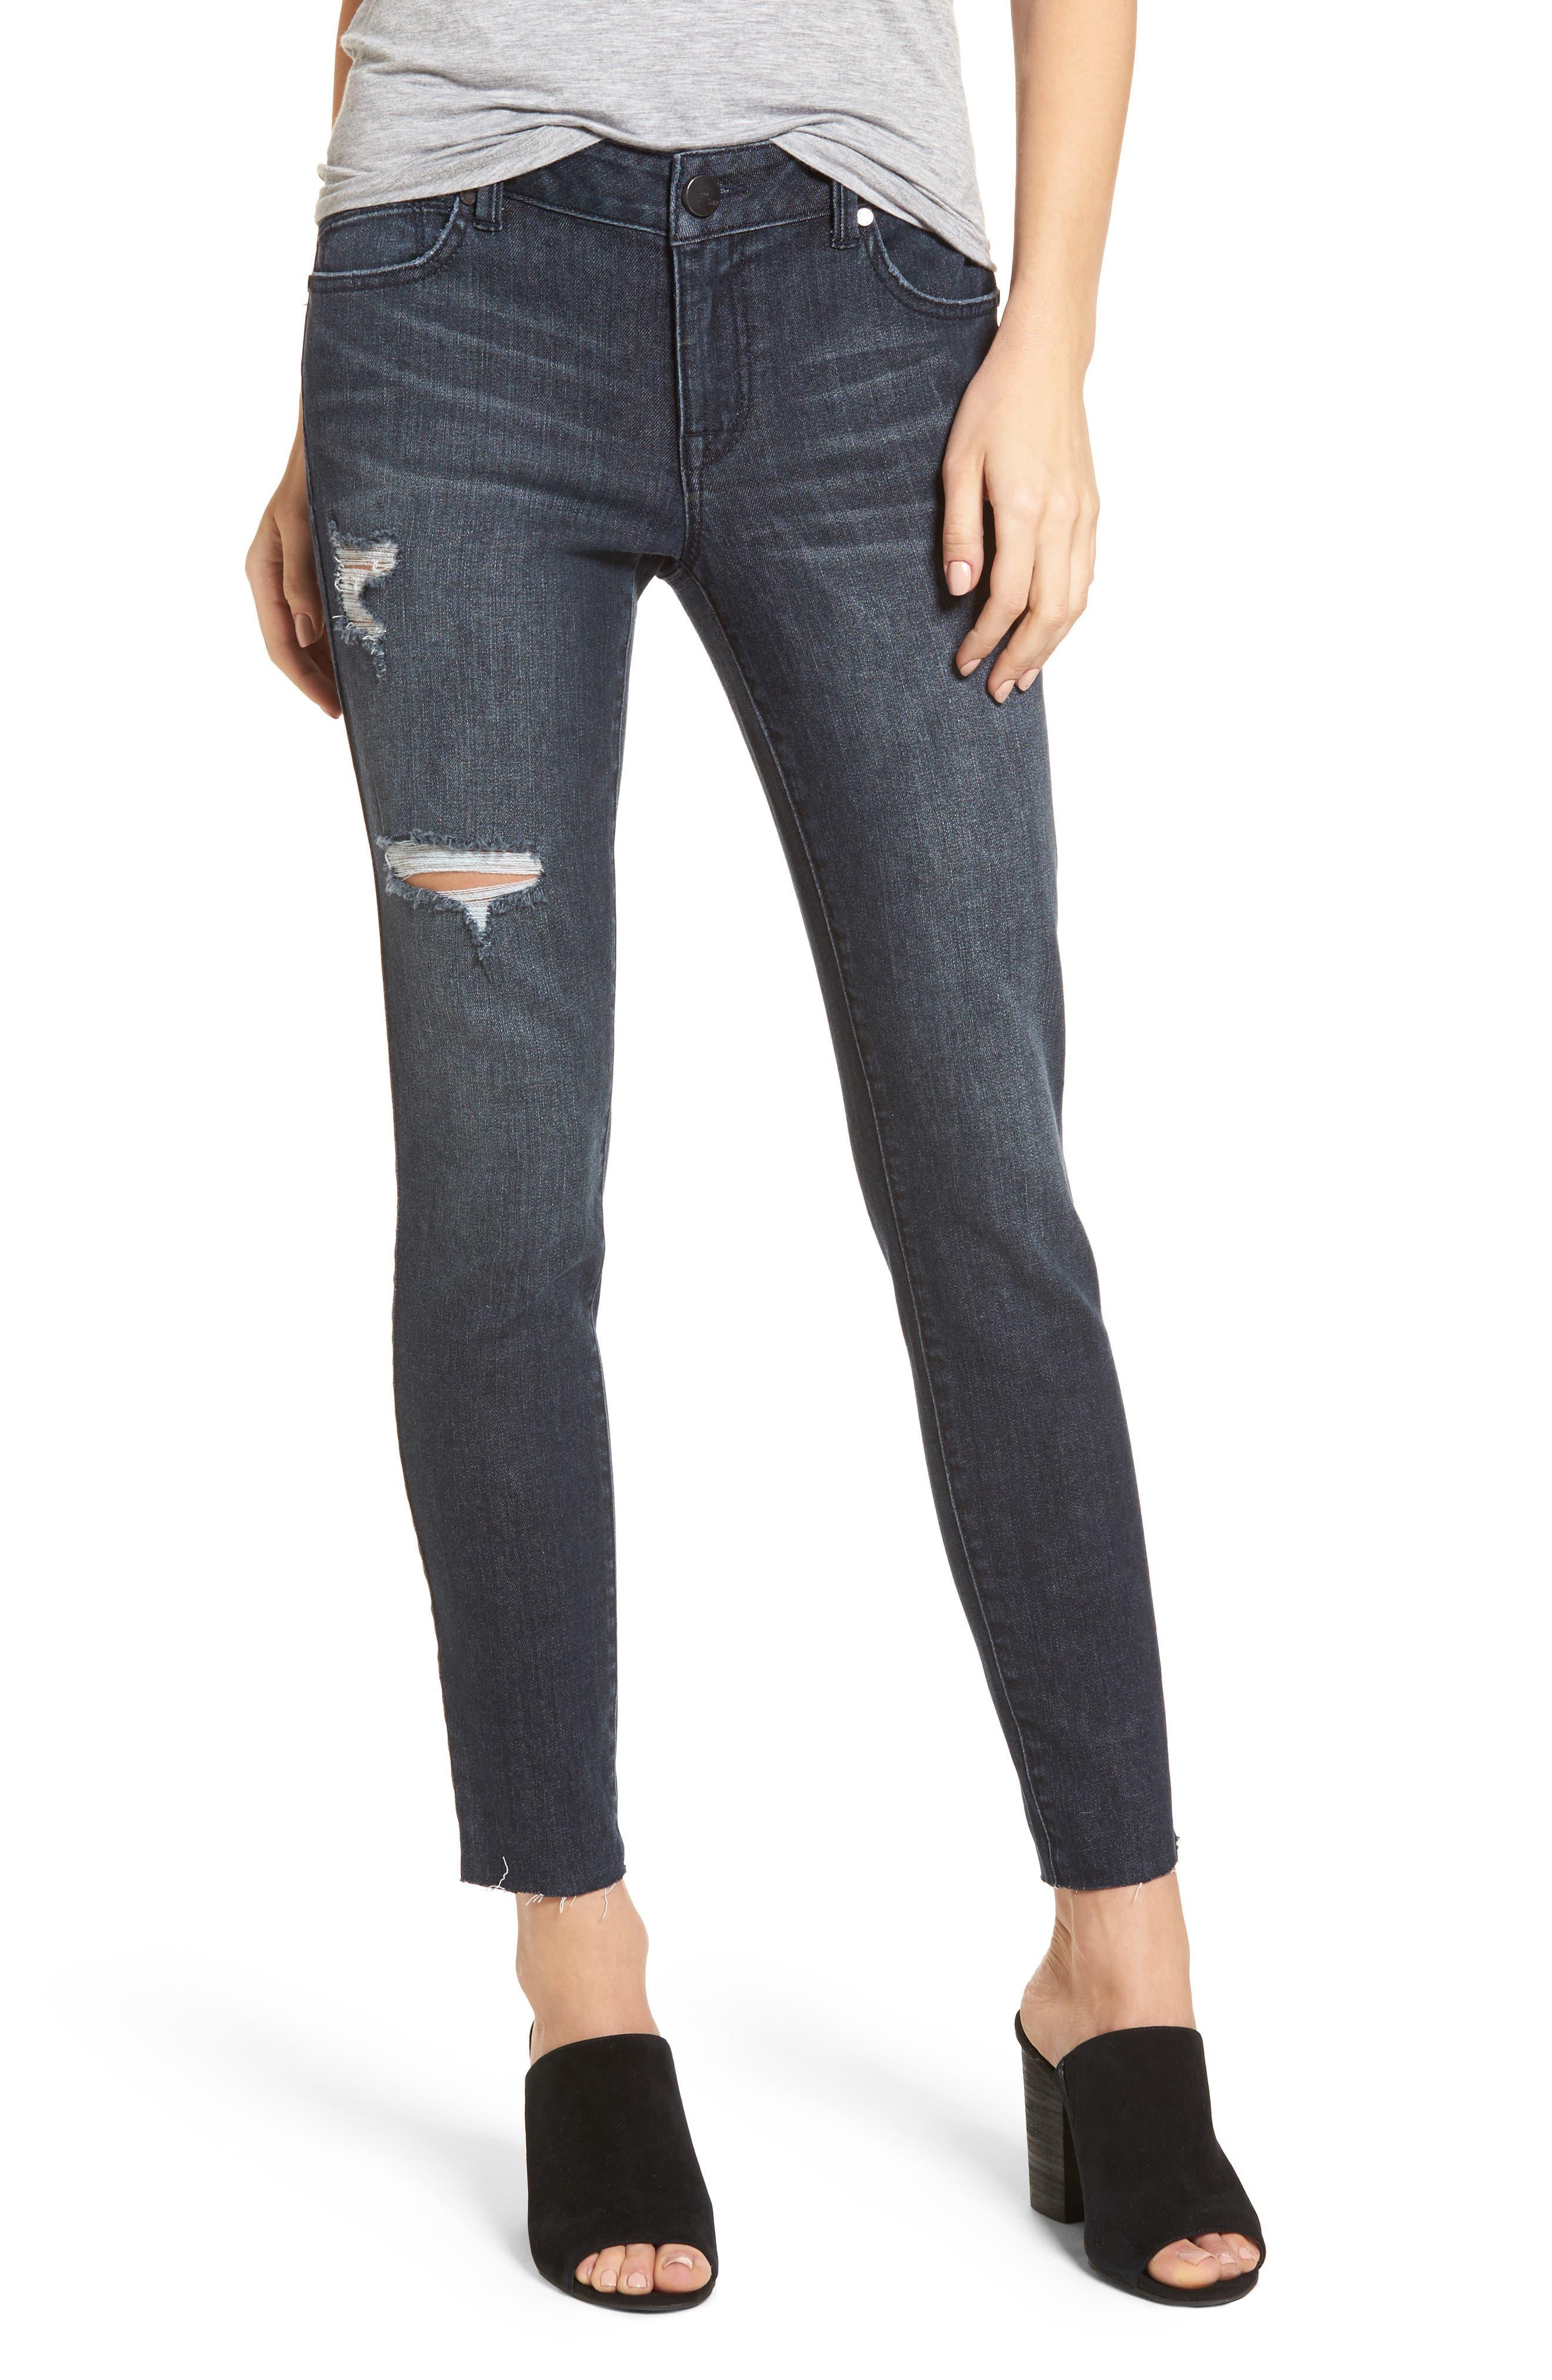 Alternate Image 1 Selected - 1822 Denim Distressed Skinny Jeans (Palin)